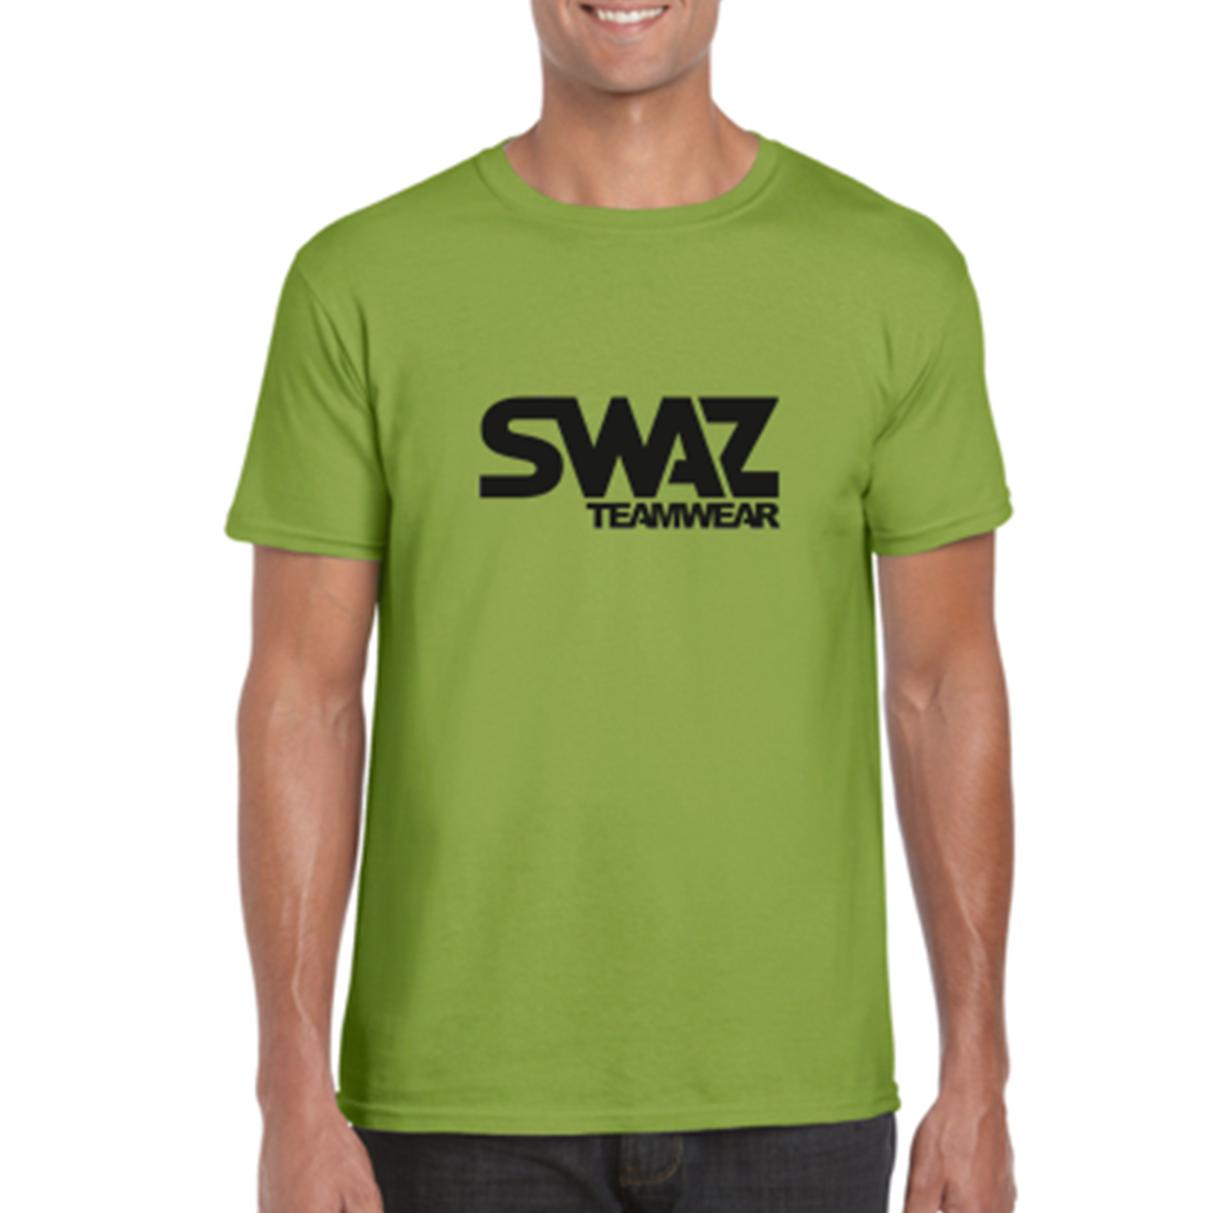 SWAZ Teamwear Kiwi Classic T-Shirt